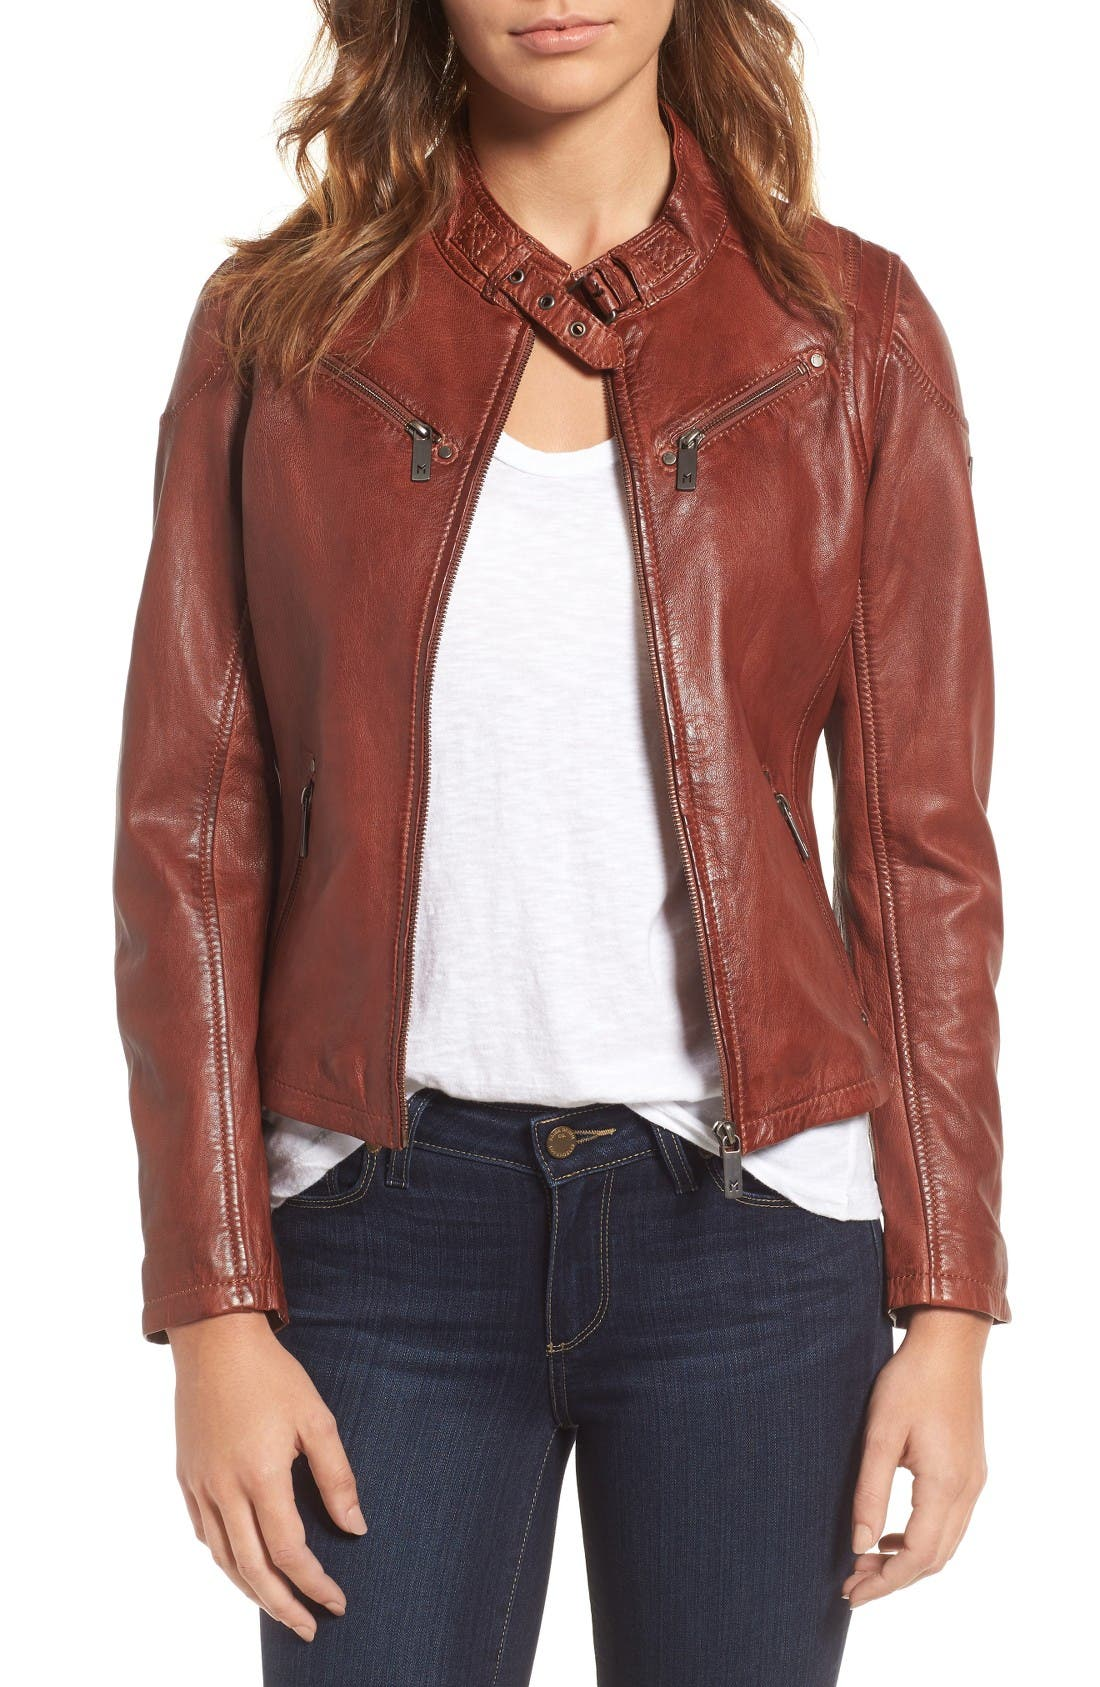 Mauritius Leather Lambskin Leather Moto Jacket